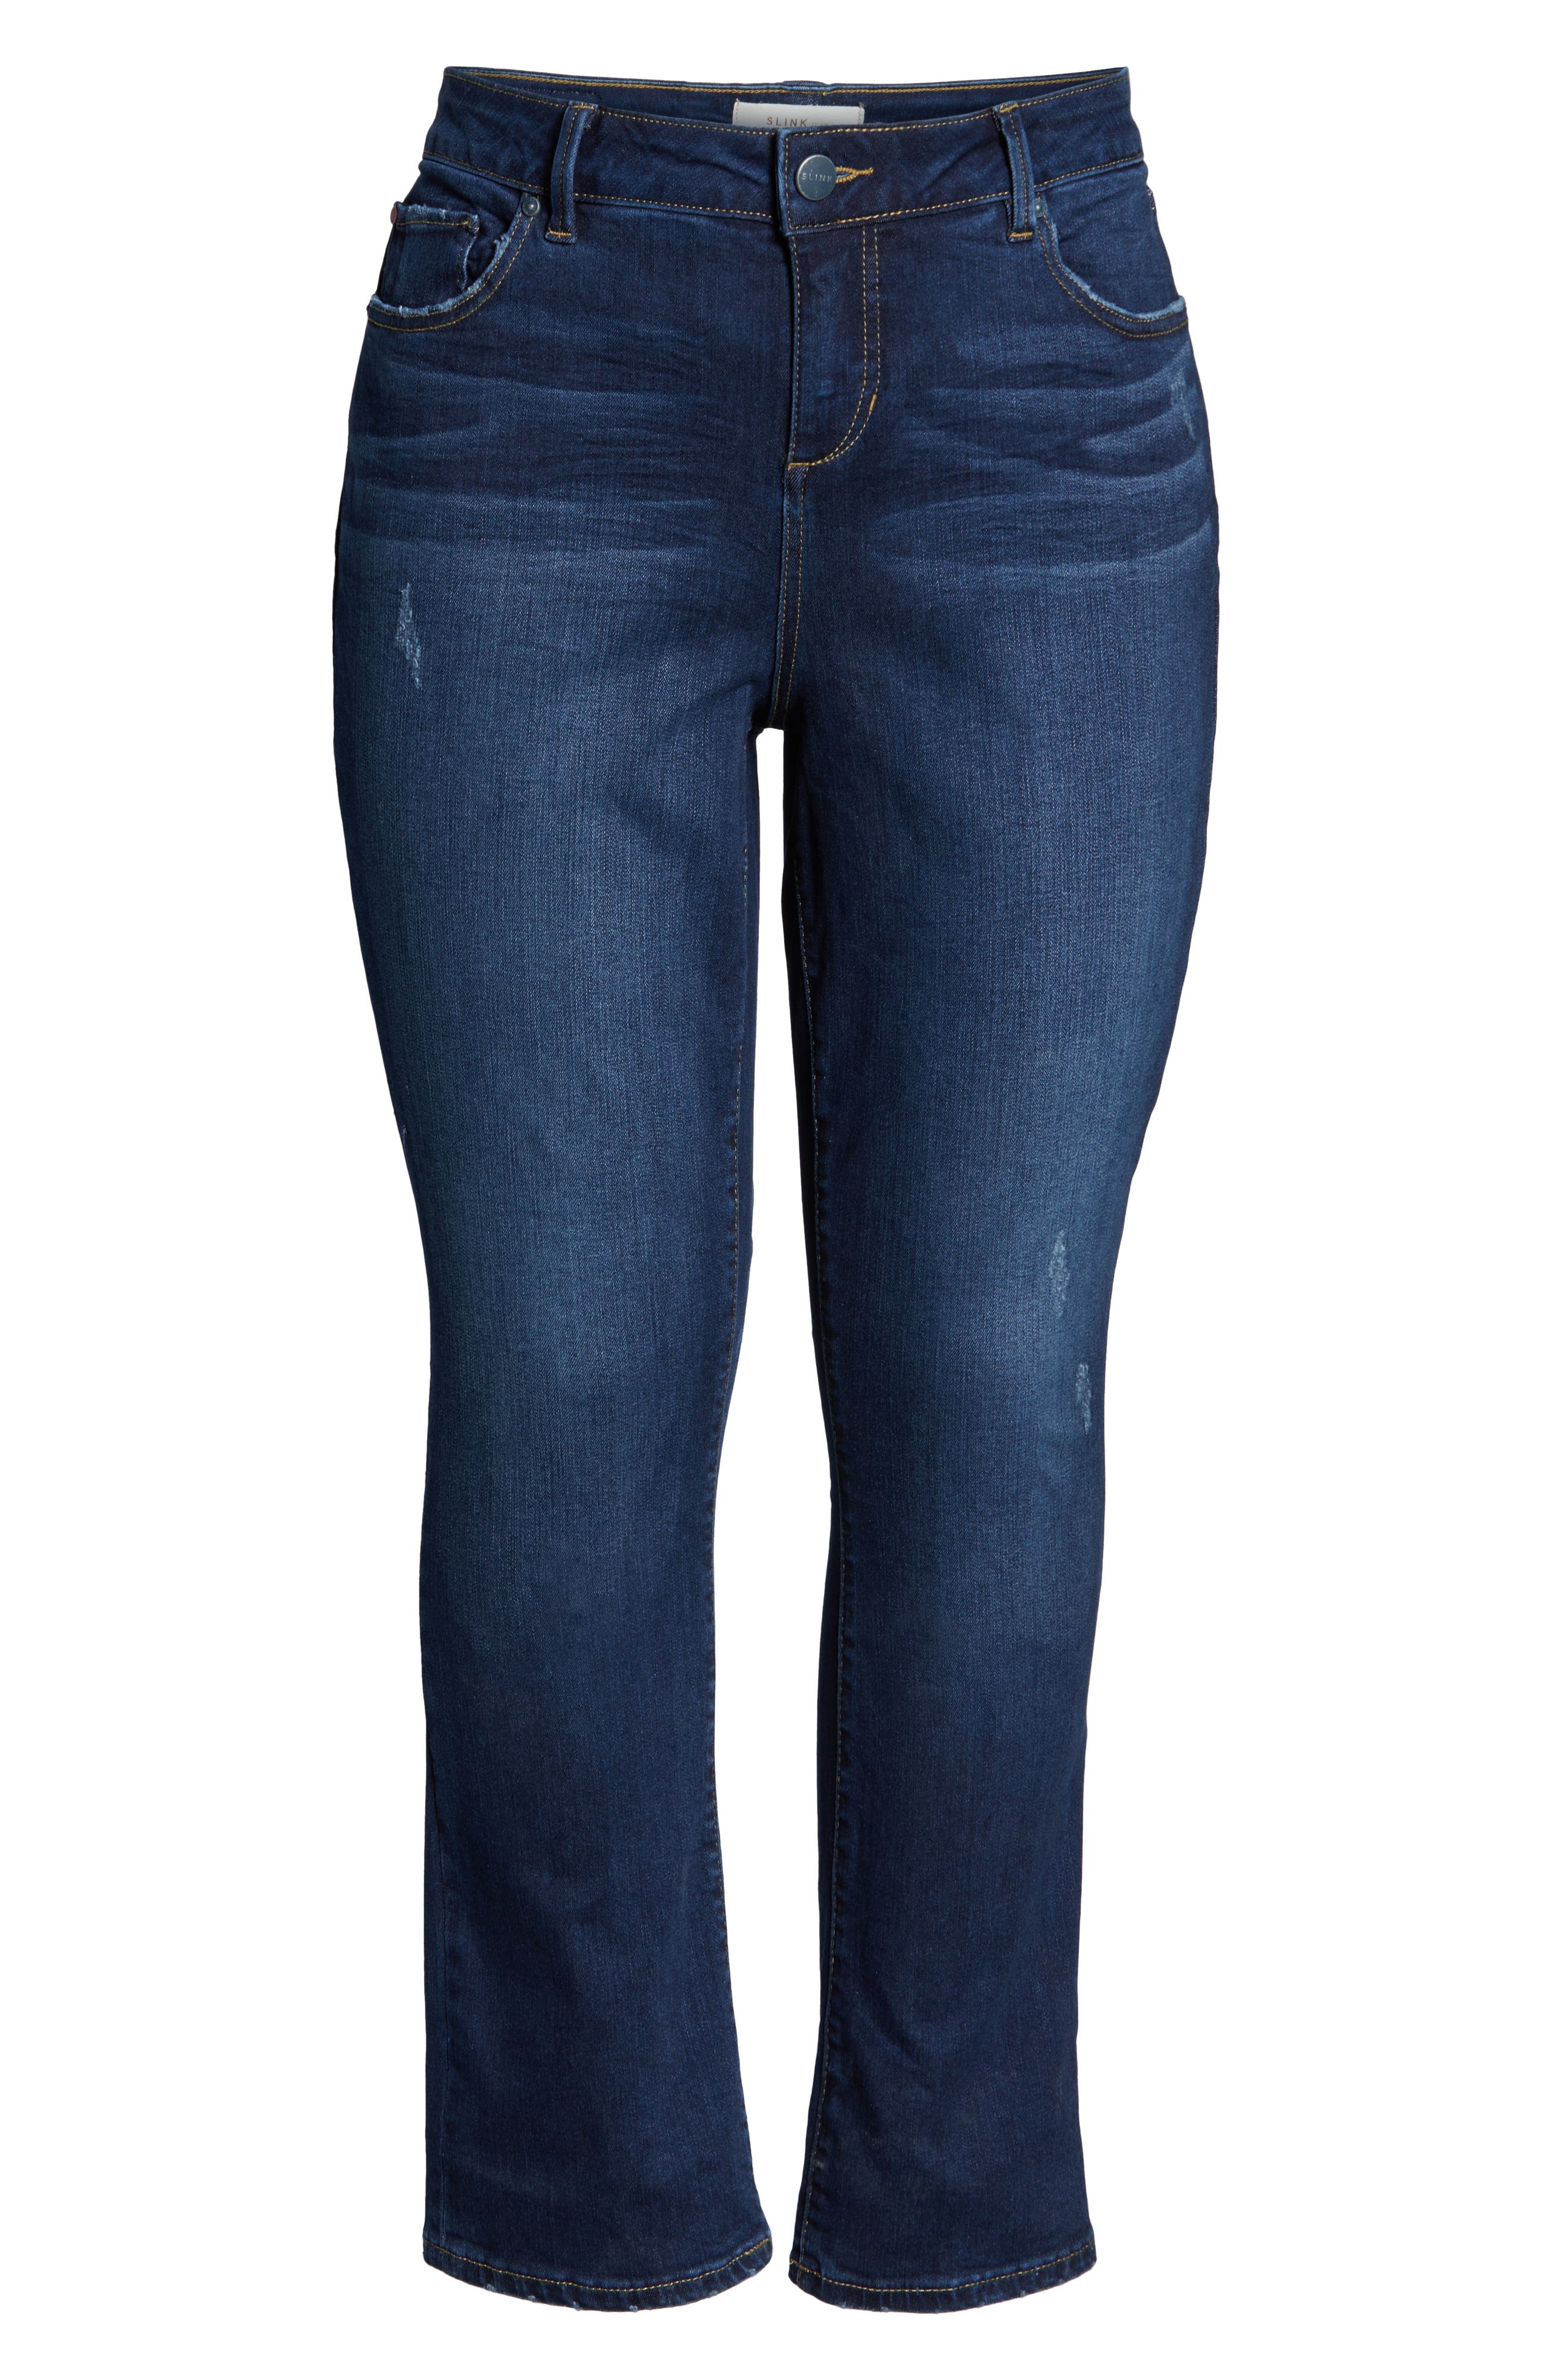 High Waist Crop Bootcut Jeans,                             Alternate thumbnail 4, color,                             SHEELA